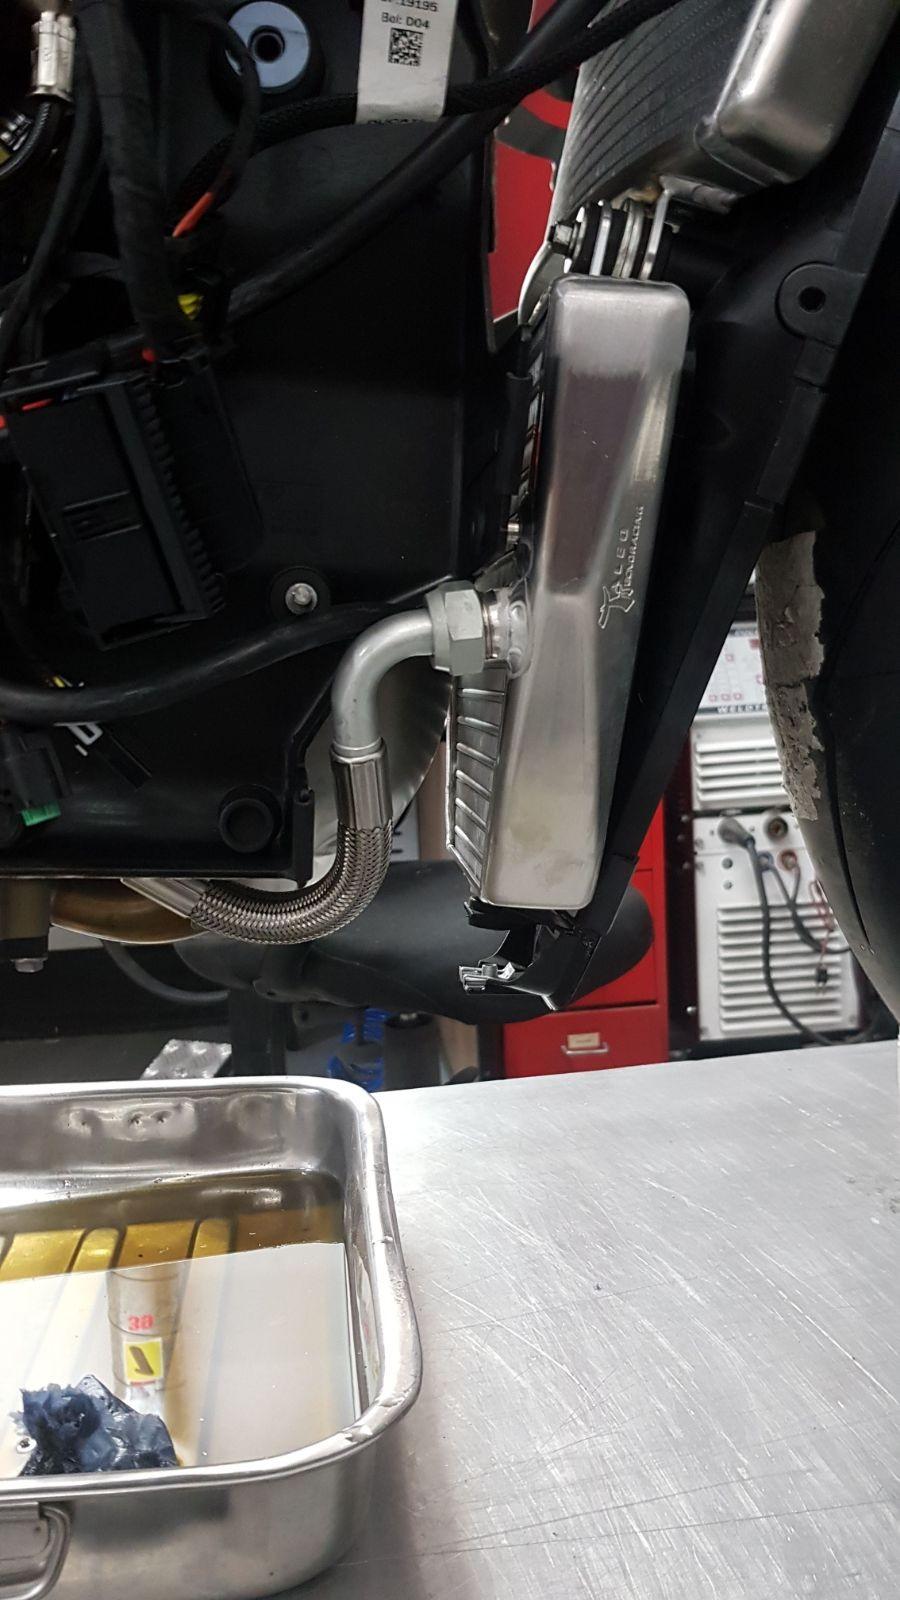 Taleo Tecnoracing Superbike Radiator Kit - Ducati V4 Panigale Superbike Water & Oil Radiator Complete Kit